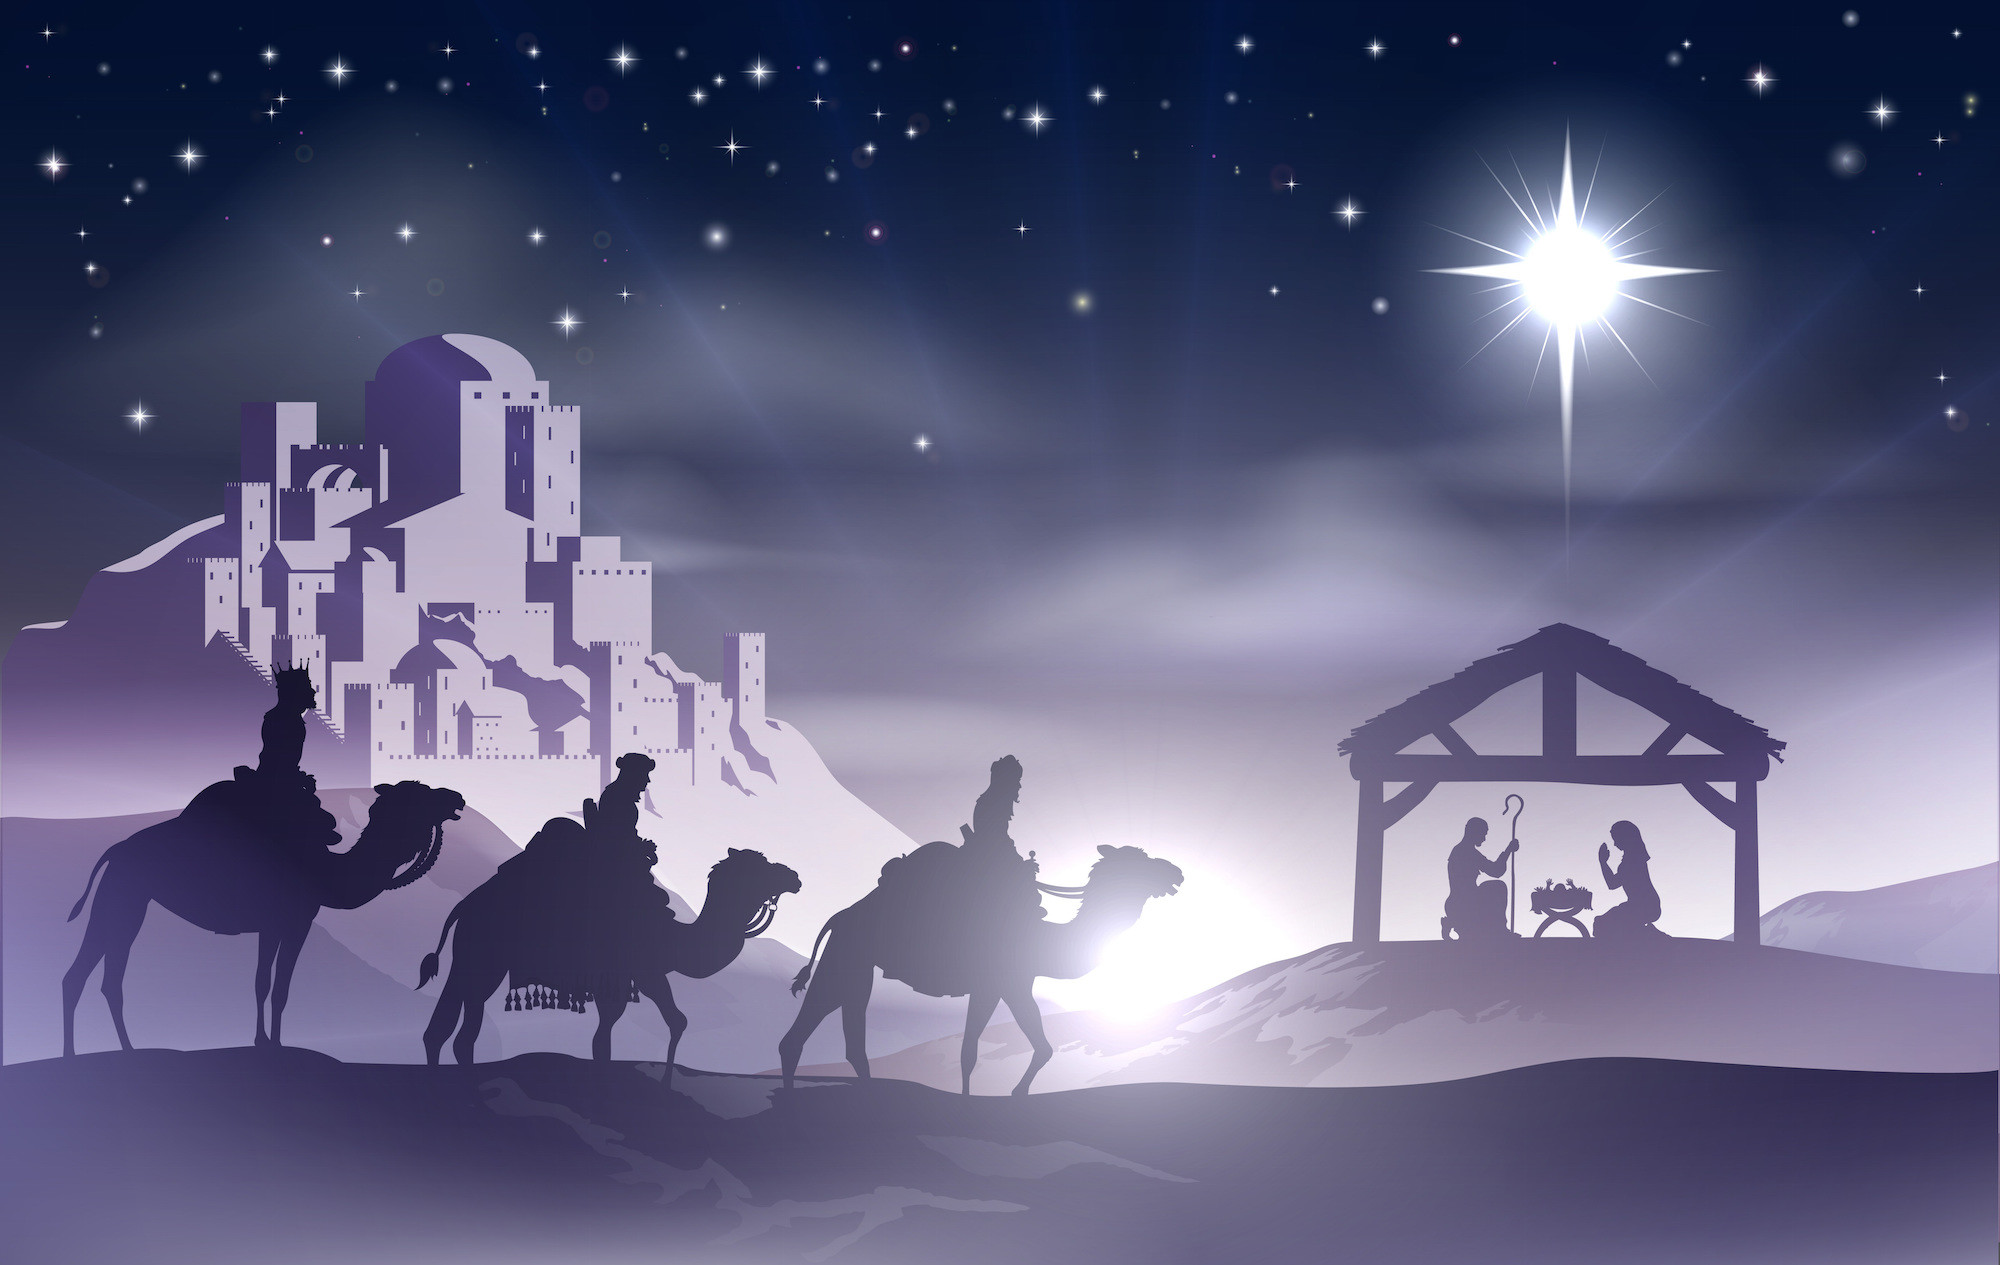 nativity wallpaper free wallpaper christian – photo #11